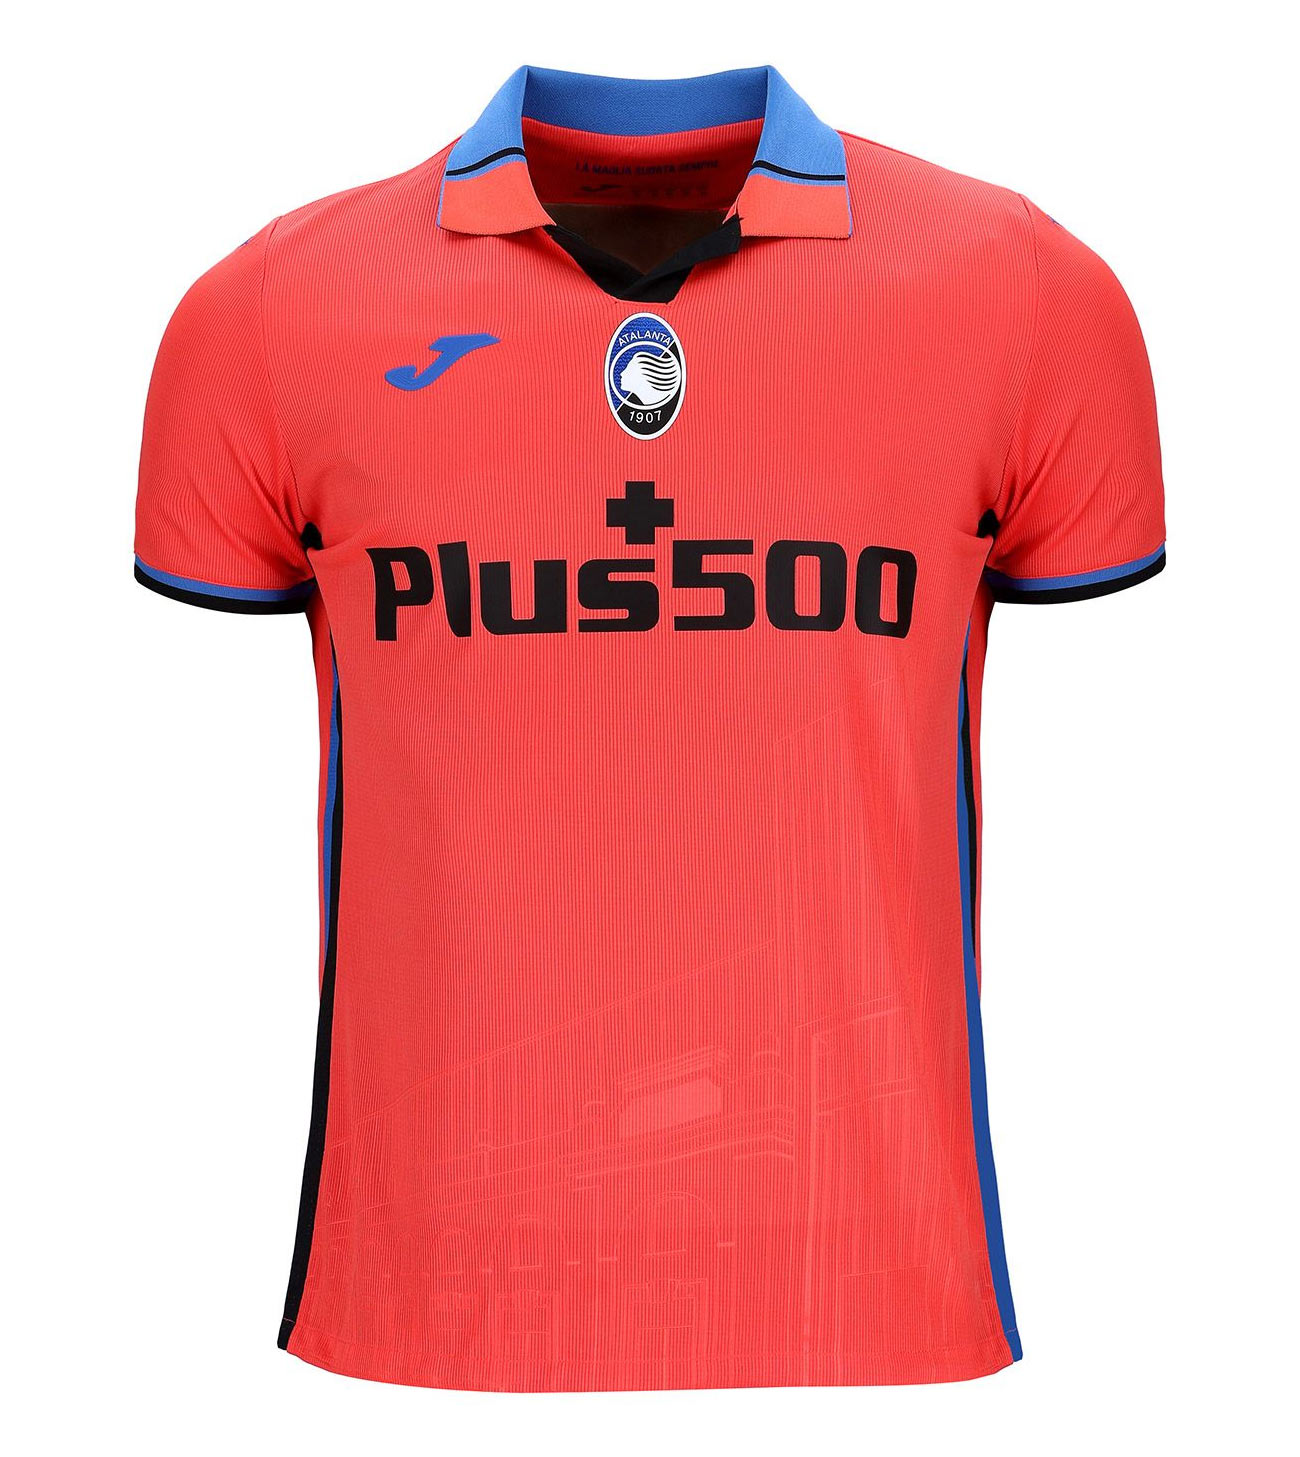 Terza maglia Atalanta salmone 2021-2022